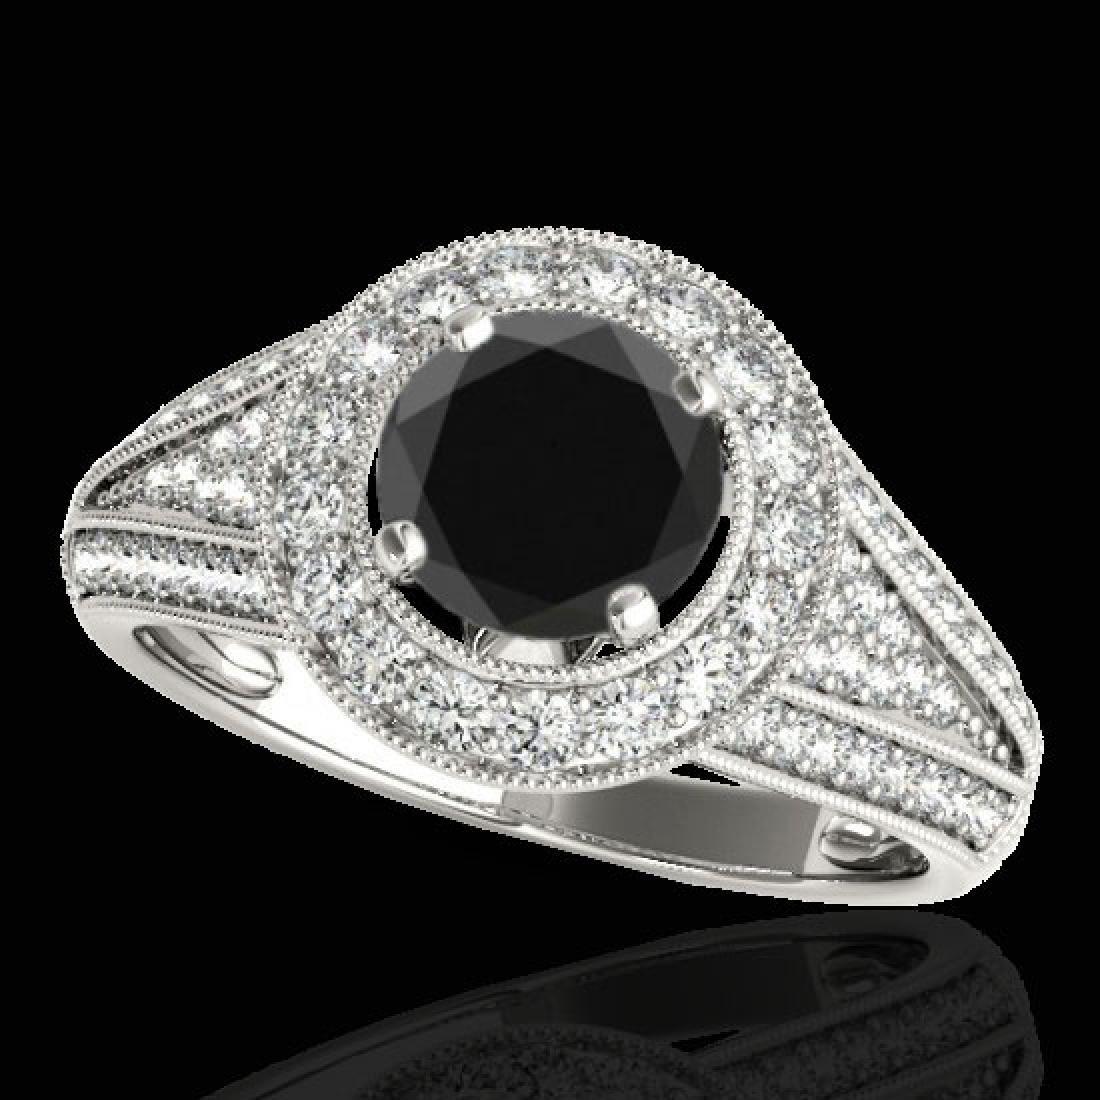 2.17 CTW Certified VS Black Diamond Solitaire Halo Ring